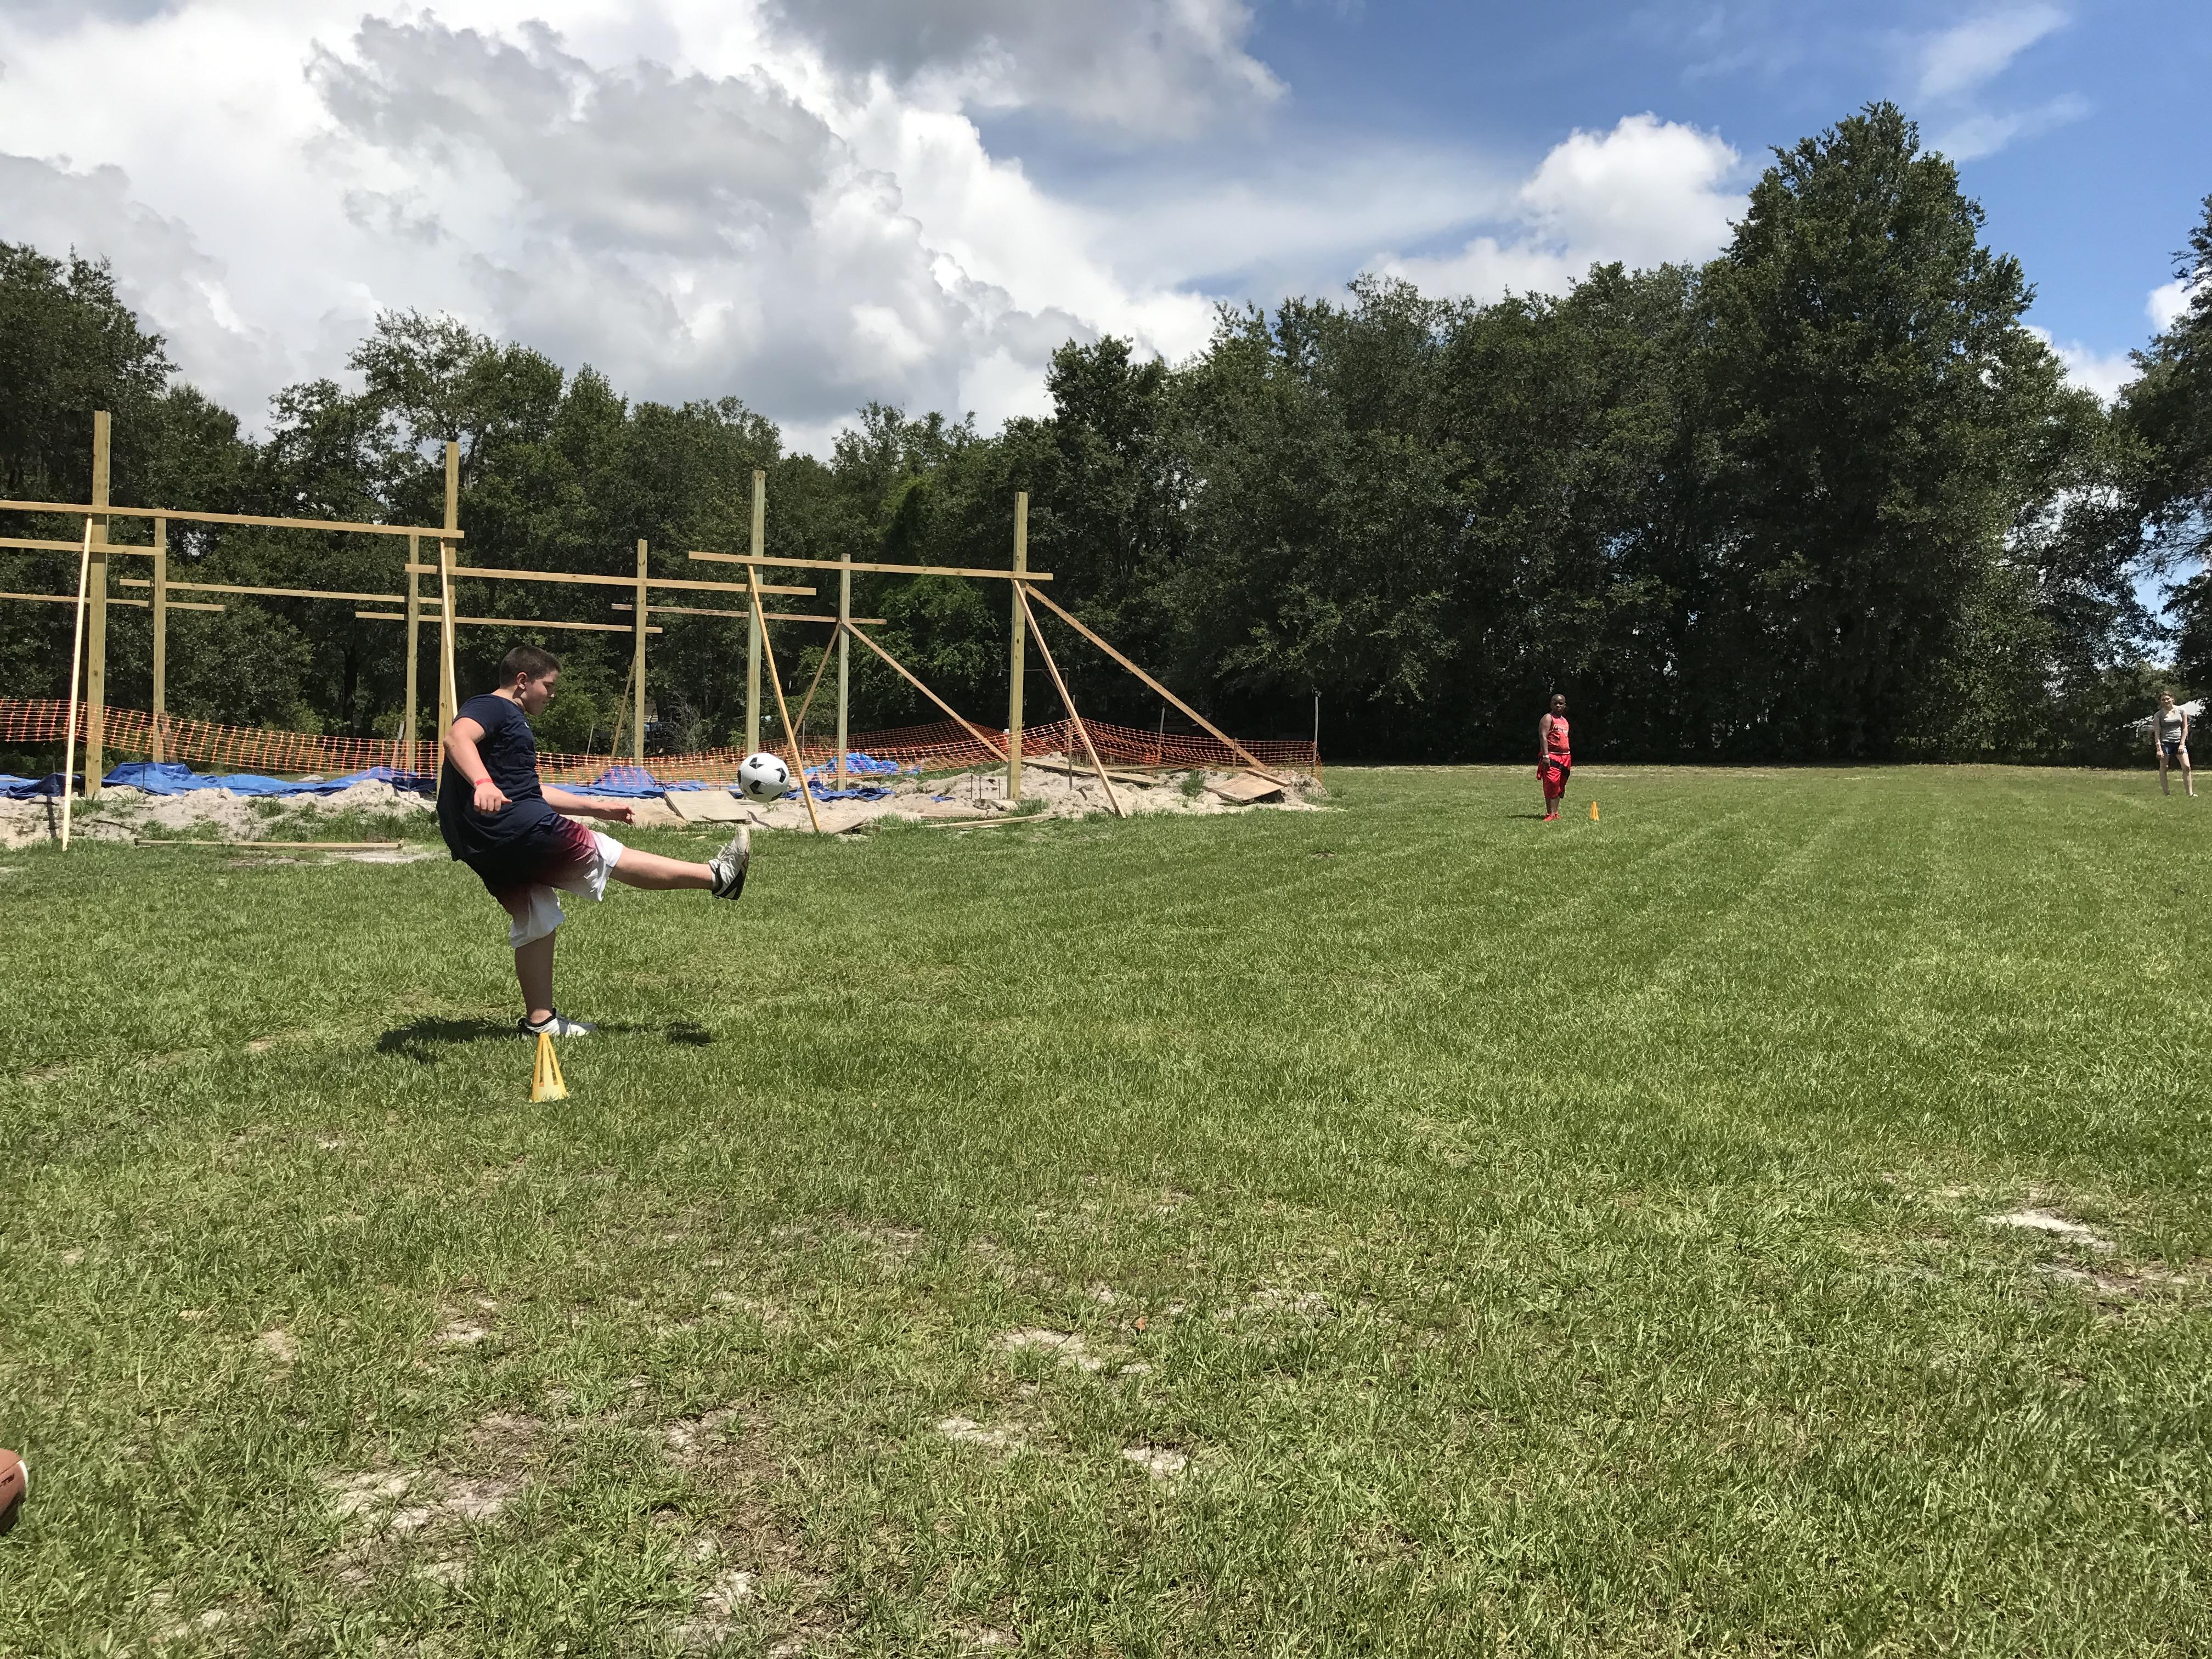 2017-07-18 12.09.30